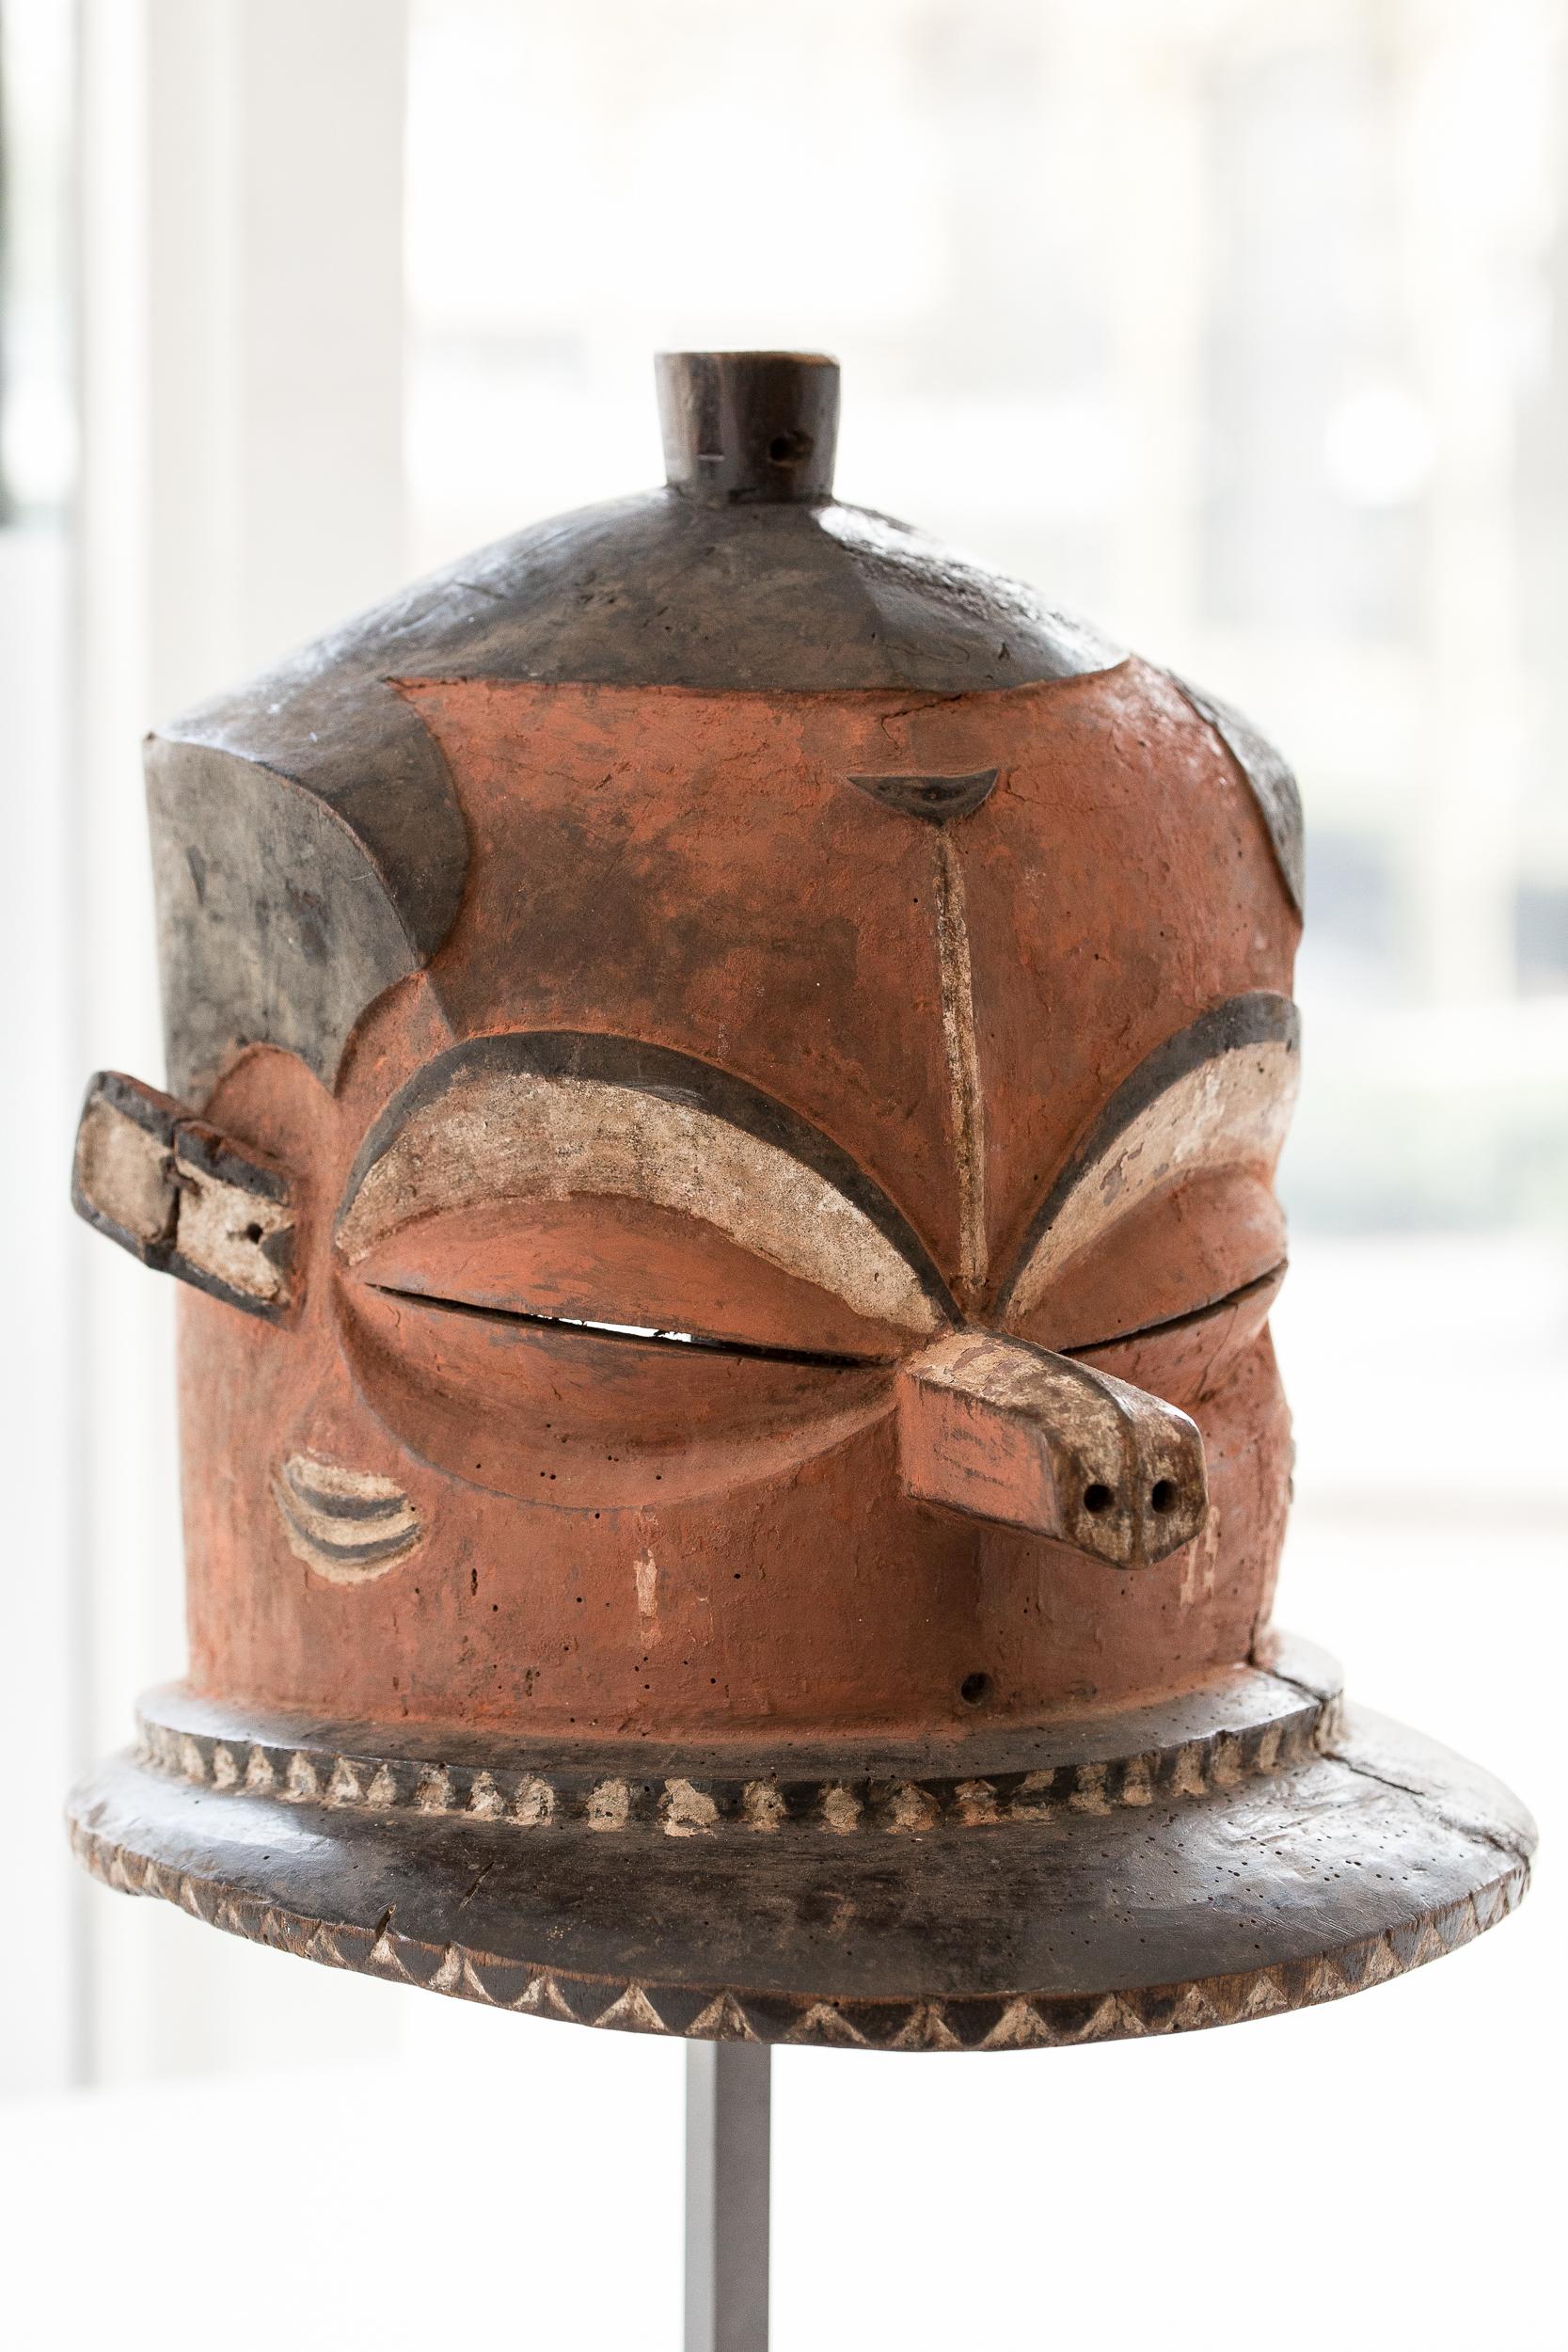 tribal-art-oostende-ostende-exposition-galerie-lz-art-africain-belgique-6.jpg